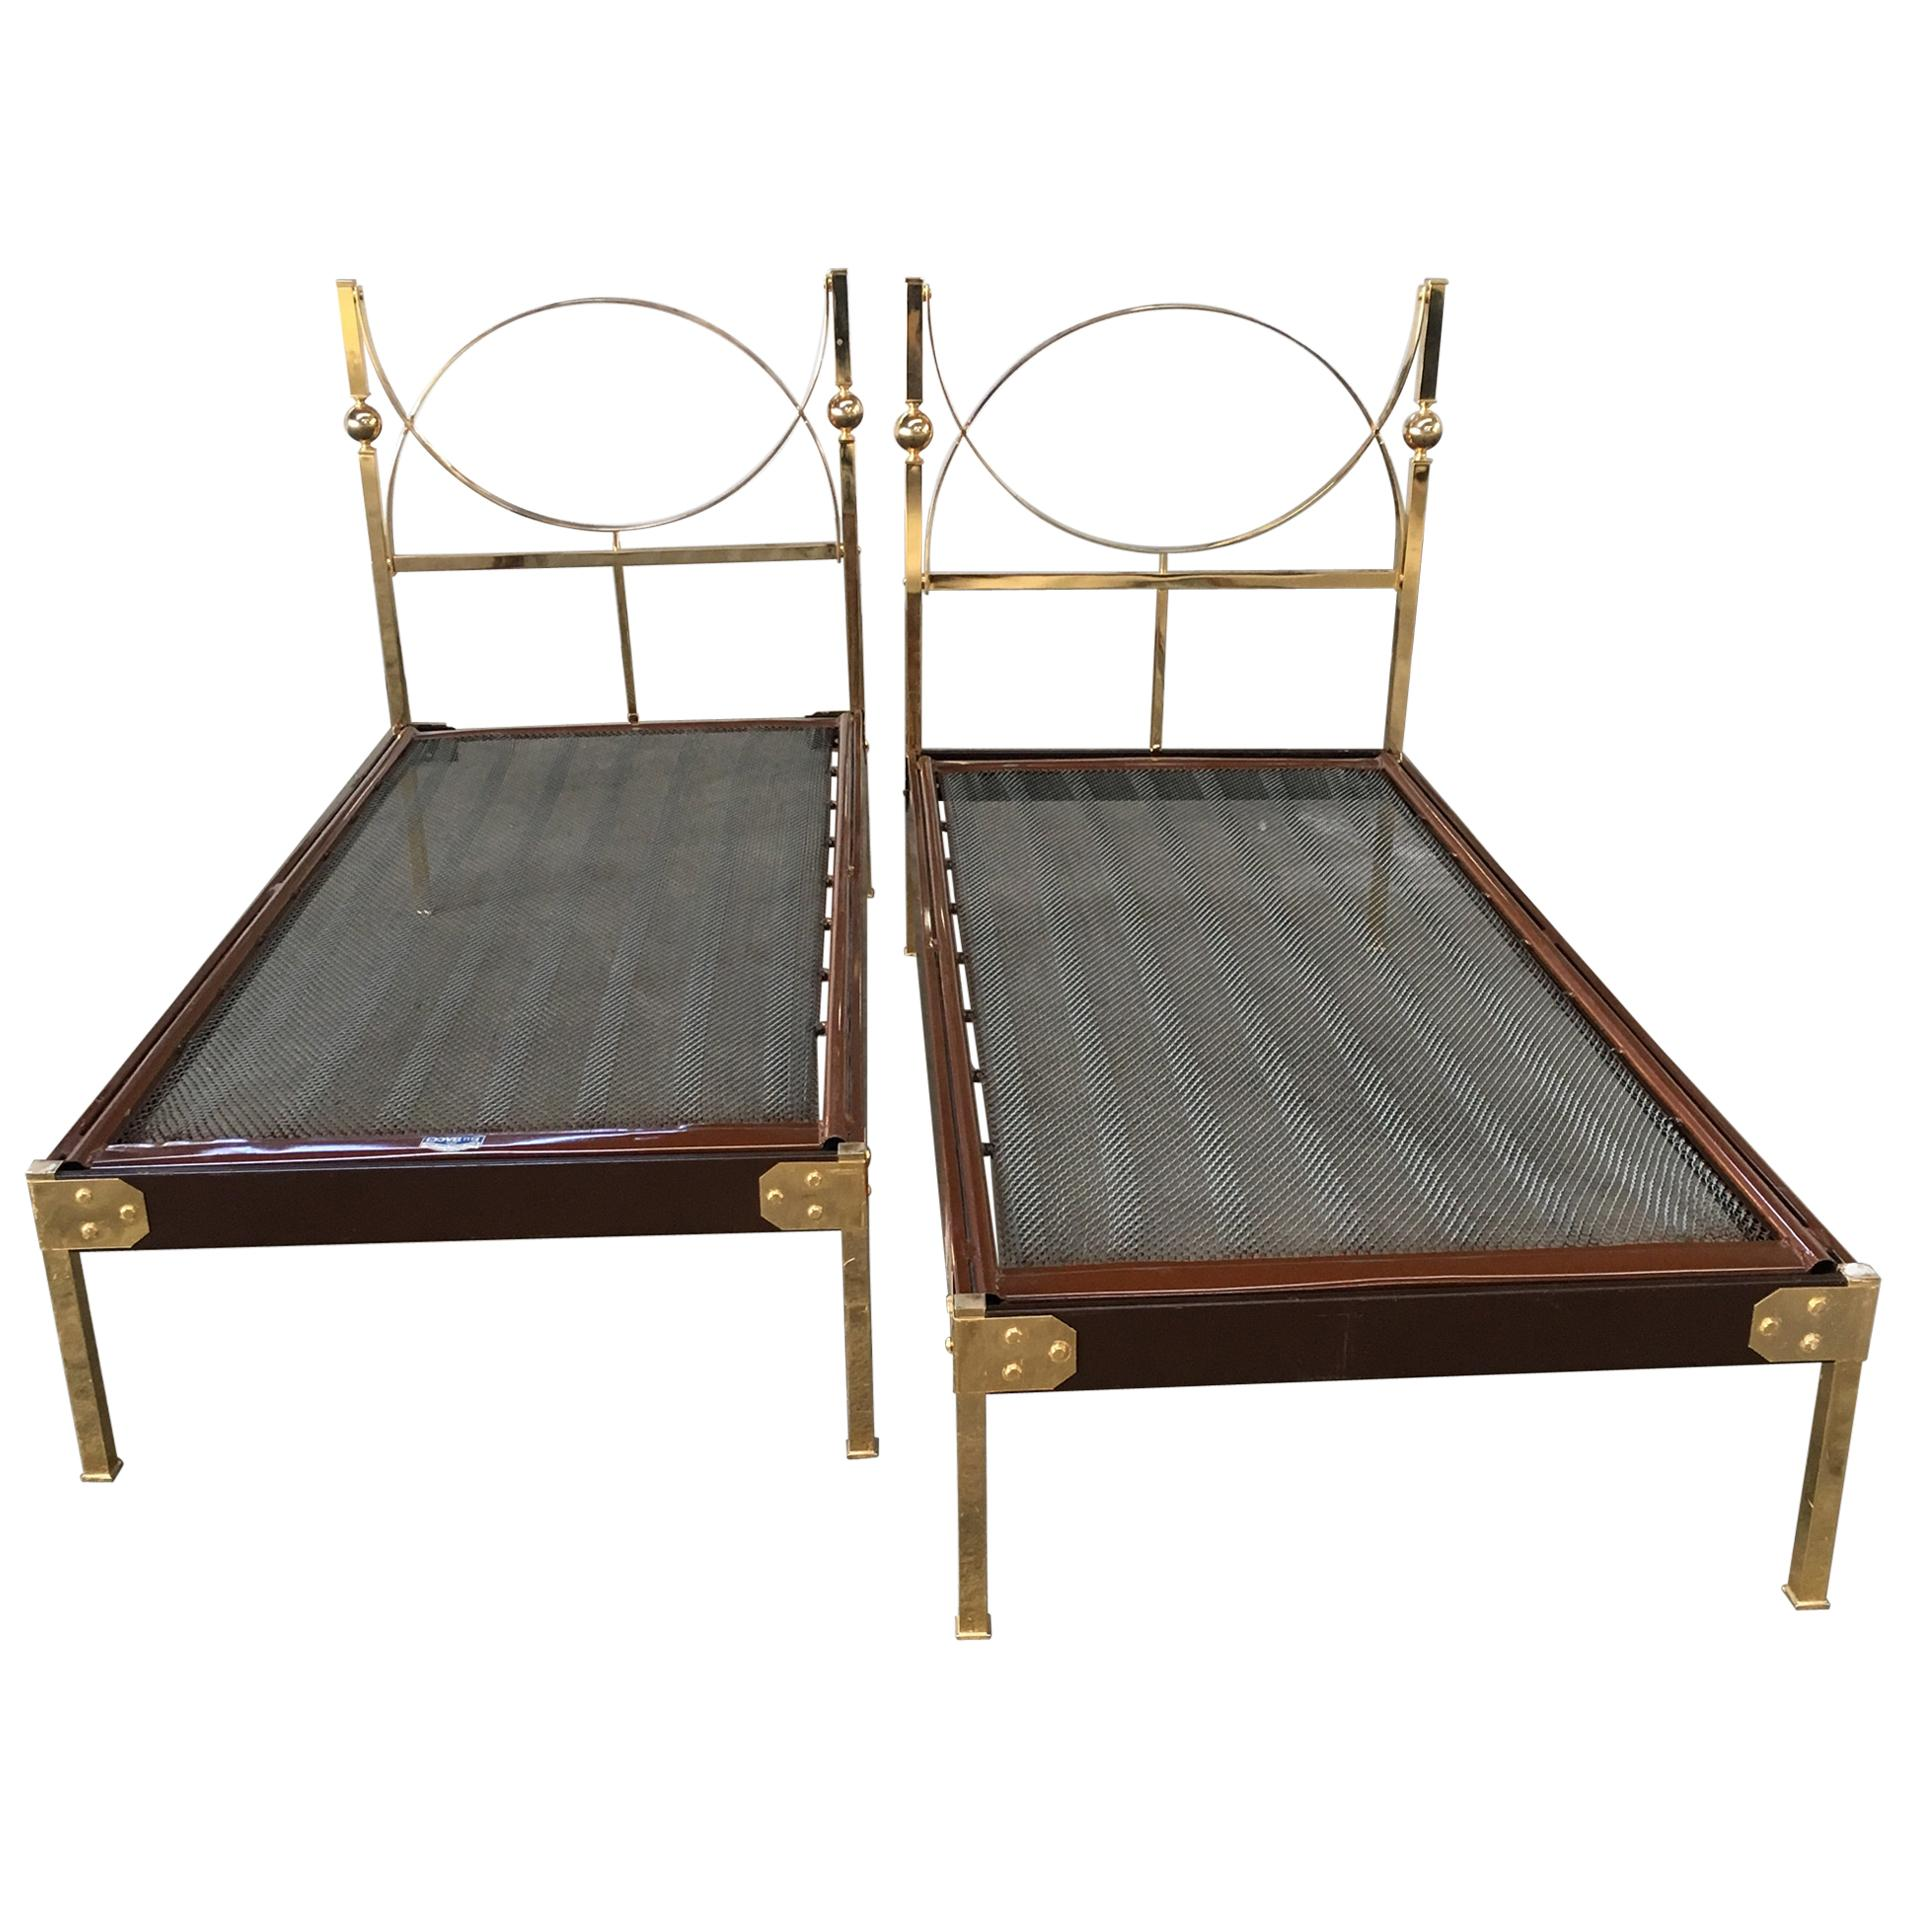 Mid-Century Modern Pair of Italian Single Beds with Gilt Headboard. 1960s